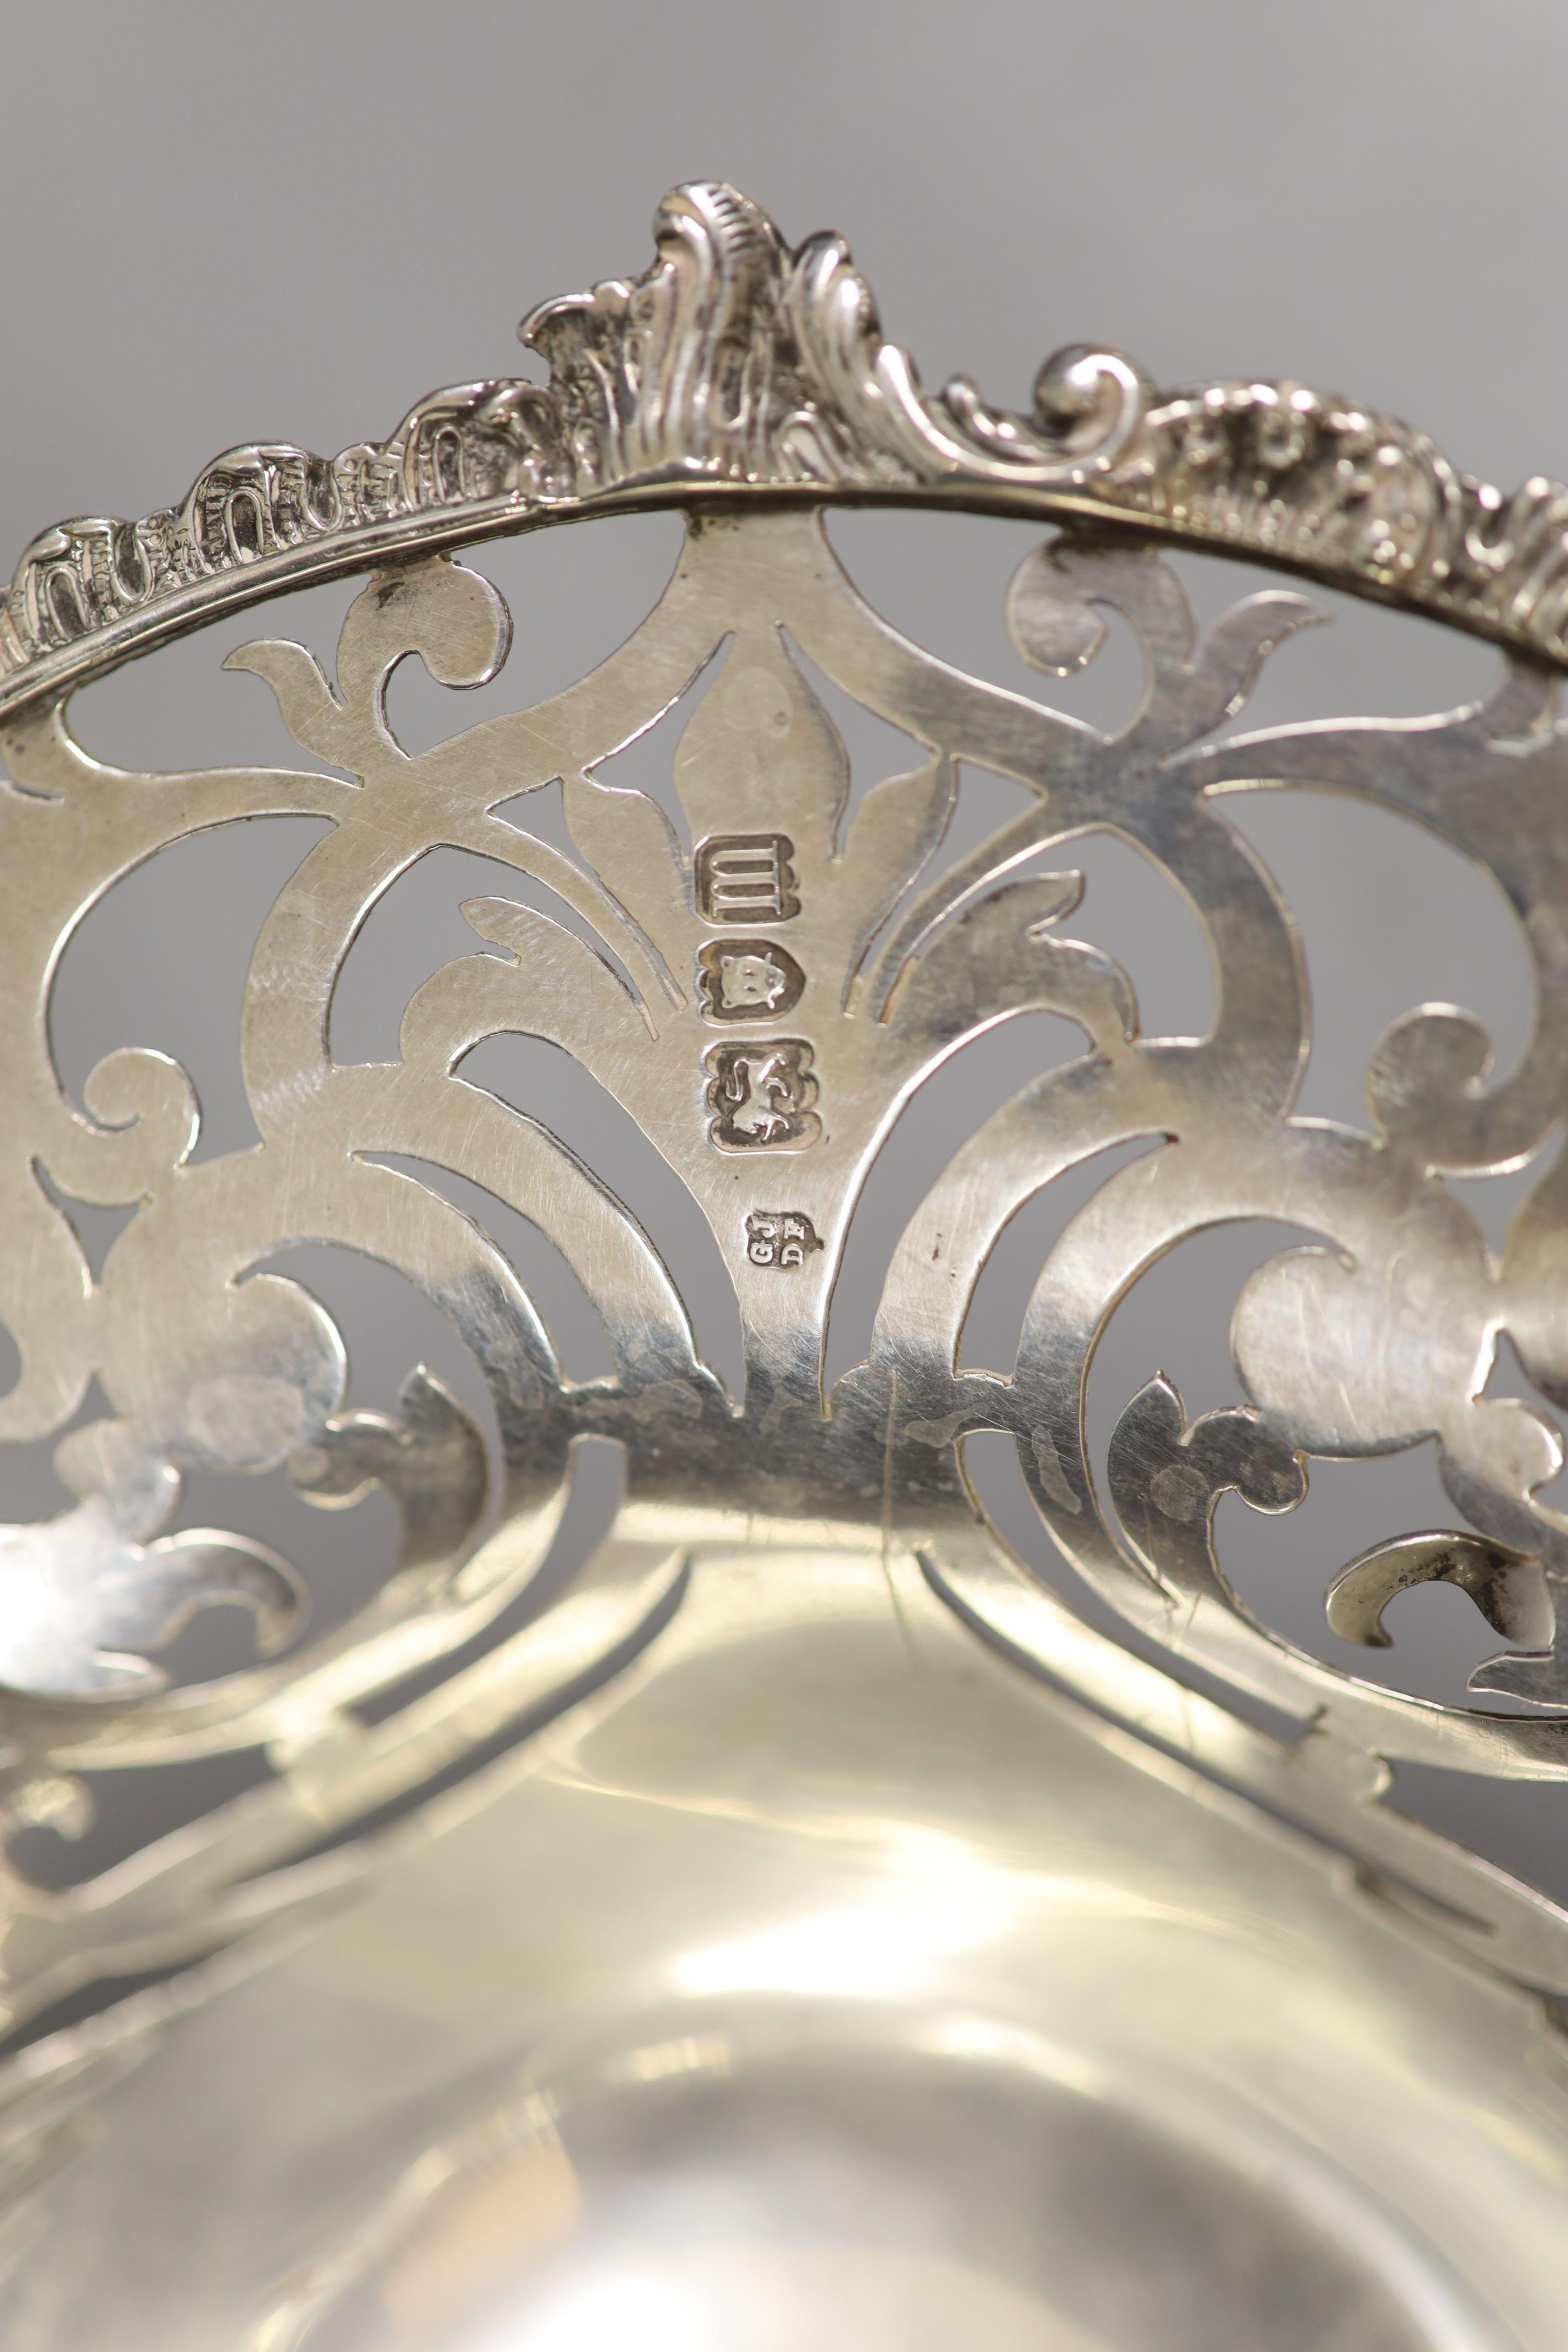 An Edwardian pierced silver oval cake basket, by Josiah Williams & Co, London, 1907, 35.2cm,25.5oz. - Image 4 of 4